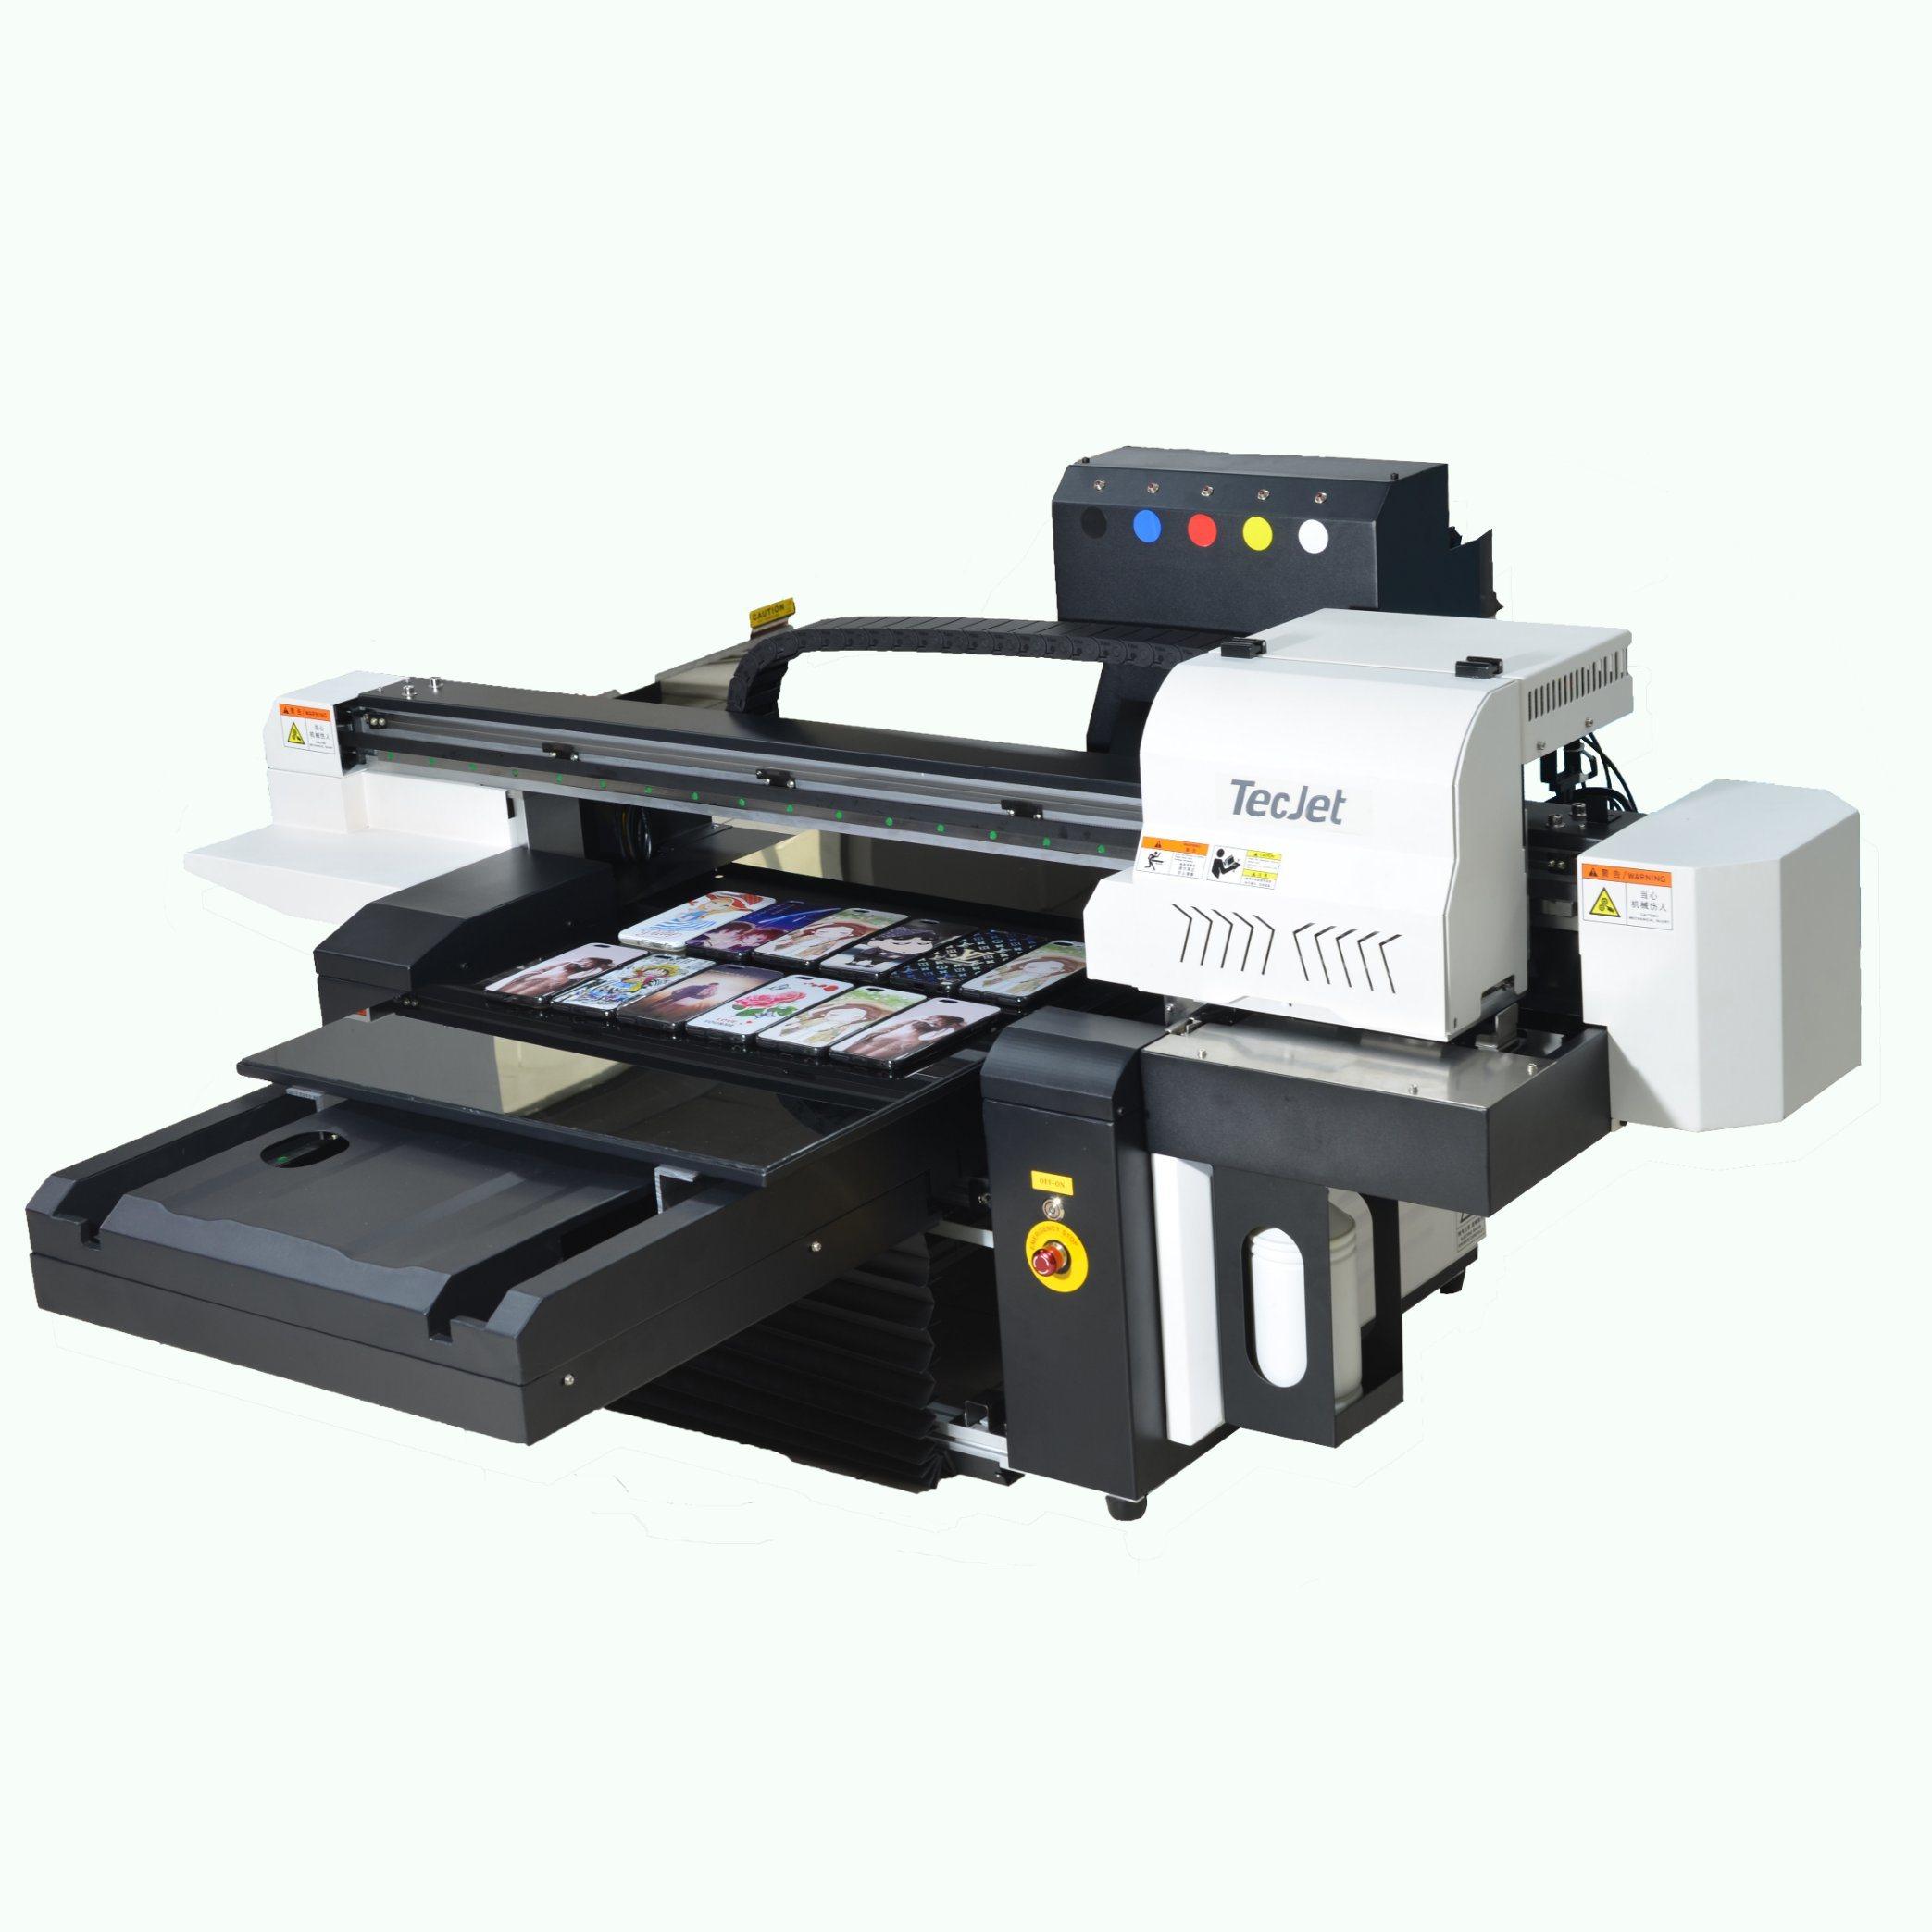 [Hot Item] Tecjet Dx5, Dx7, XP600 Printhead 6090 UV Flatbed Printer Money  Printing Machine